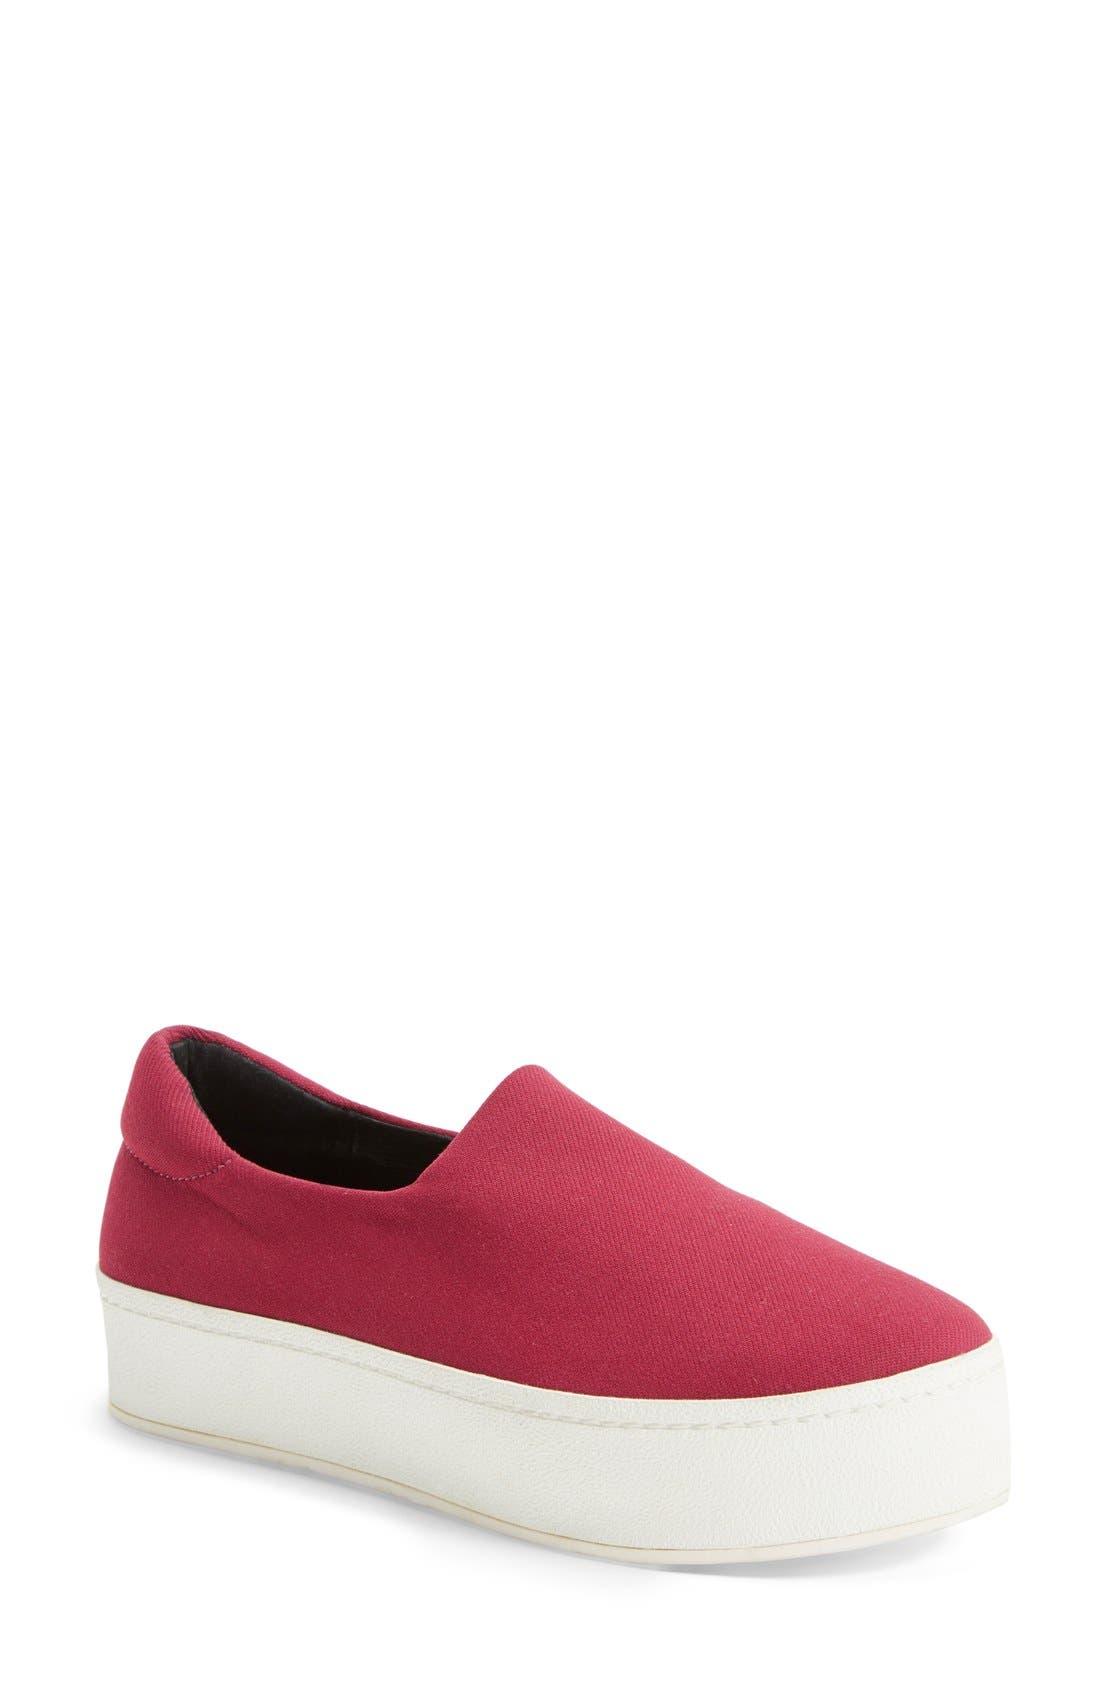 'Grunge' Slip-On Platform Sneaker,                         Main,                         color, Raspberry